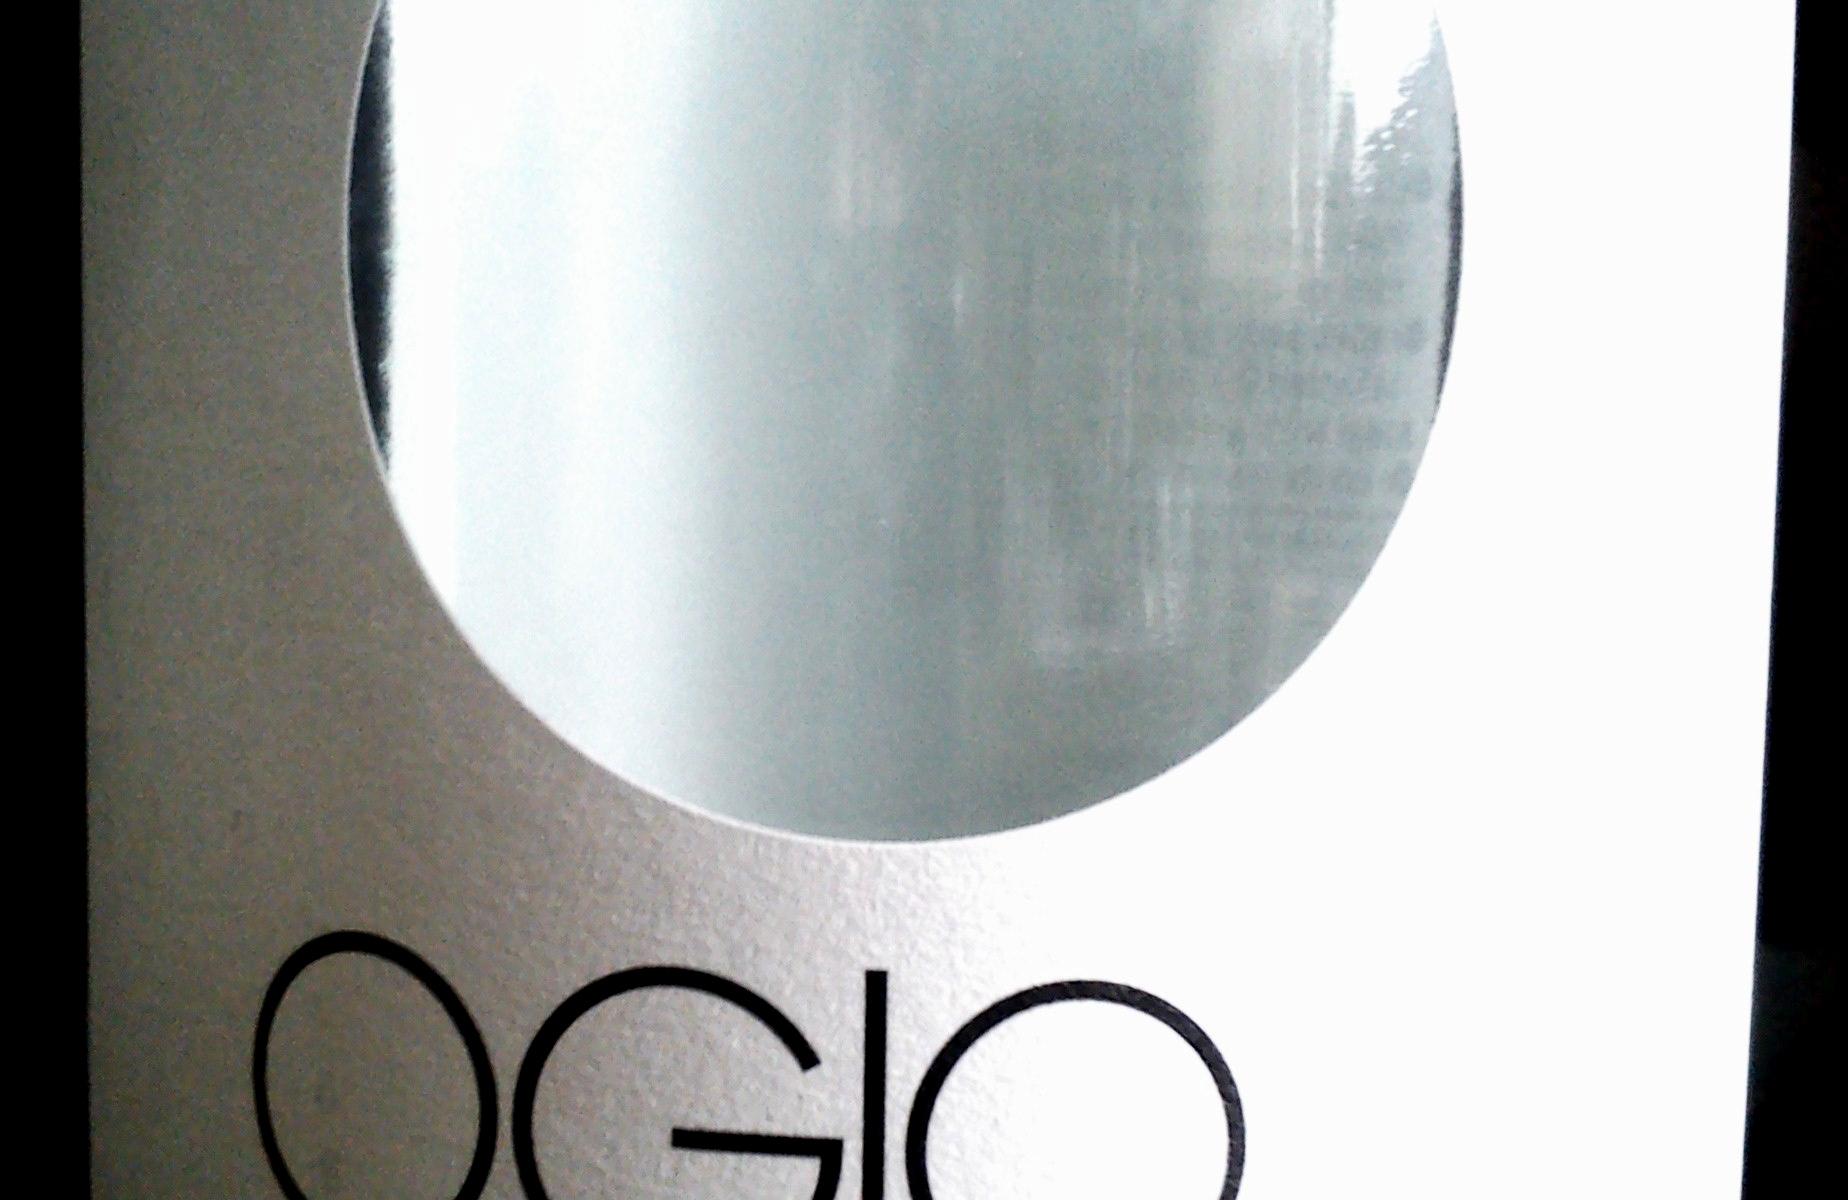 OGIO Pinot Grigio delle Venezie IGT 2012